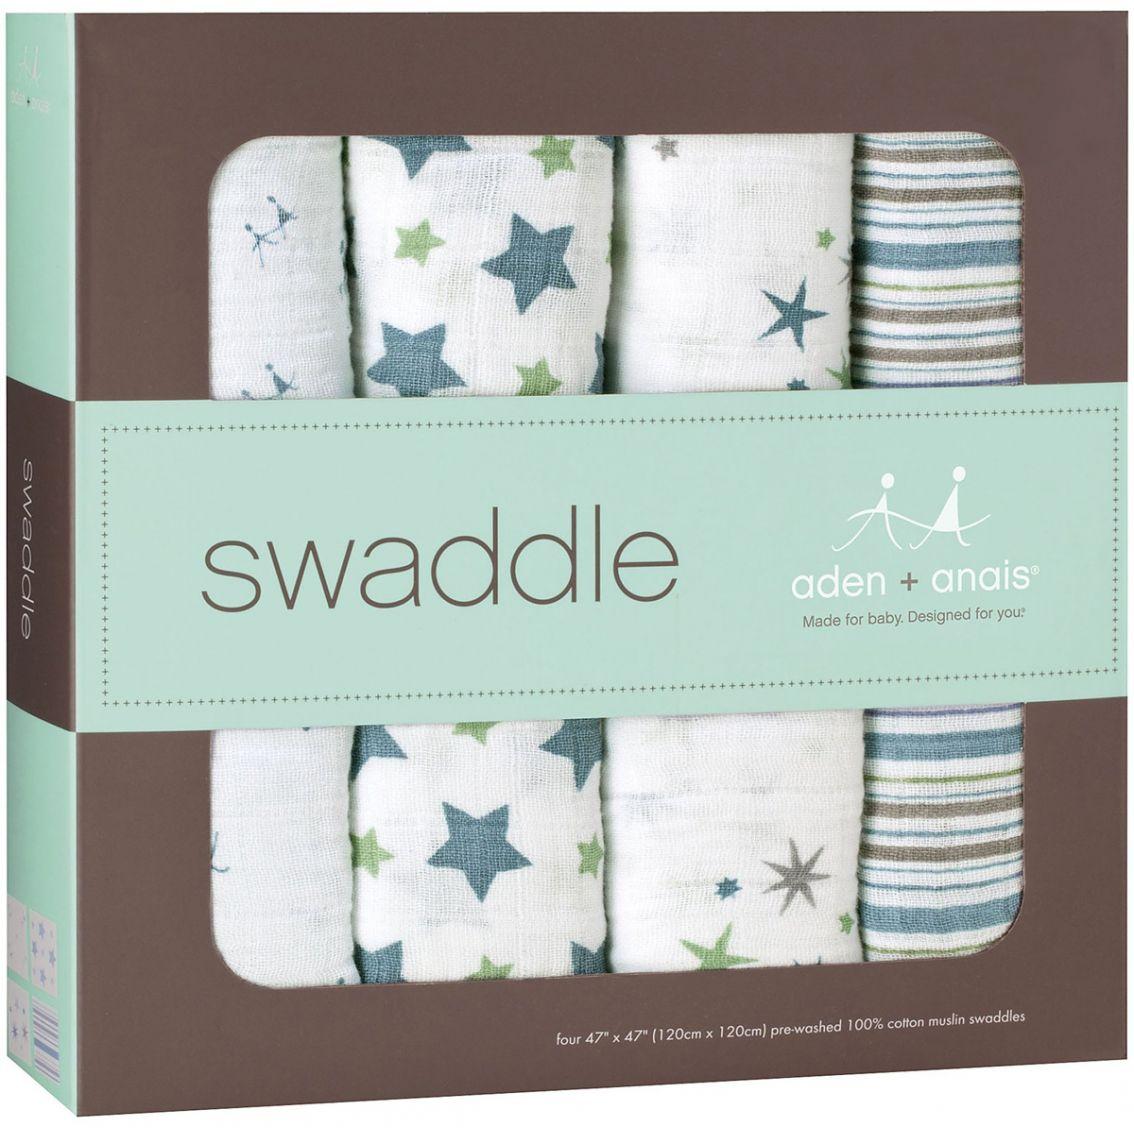 aden anais swaddle blanket prince charming. Black Bedroom Furniture Sets. Home Design Ideas